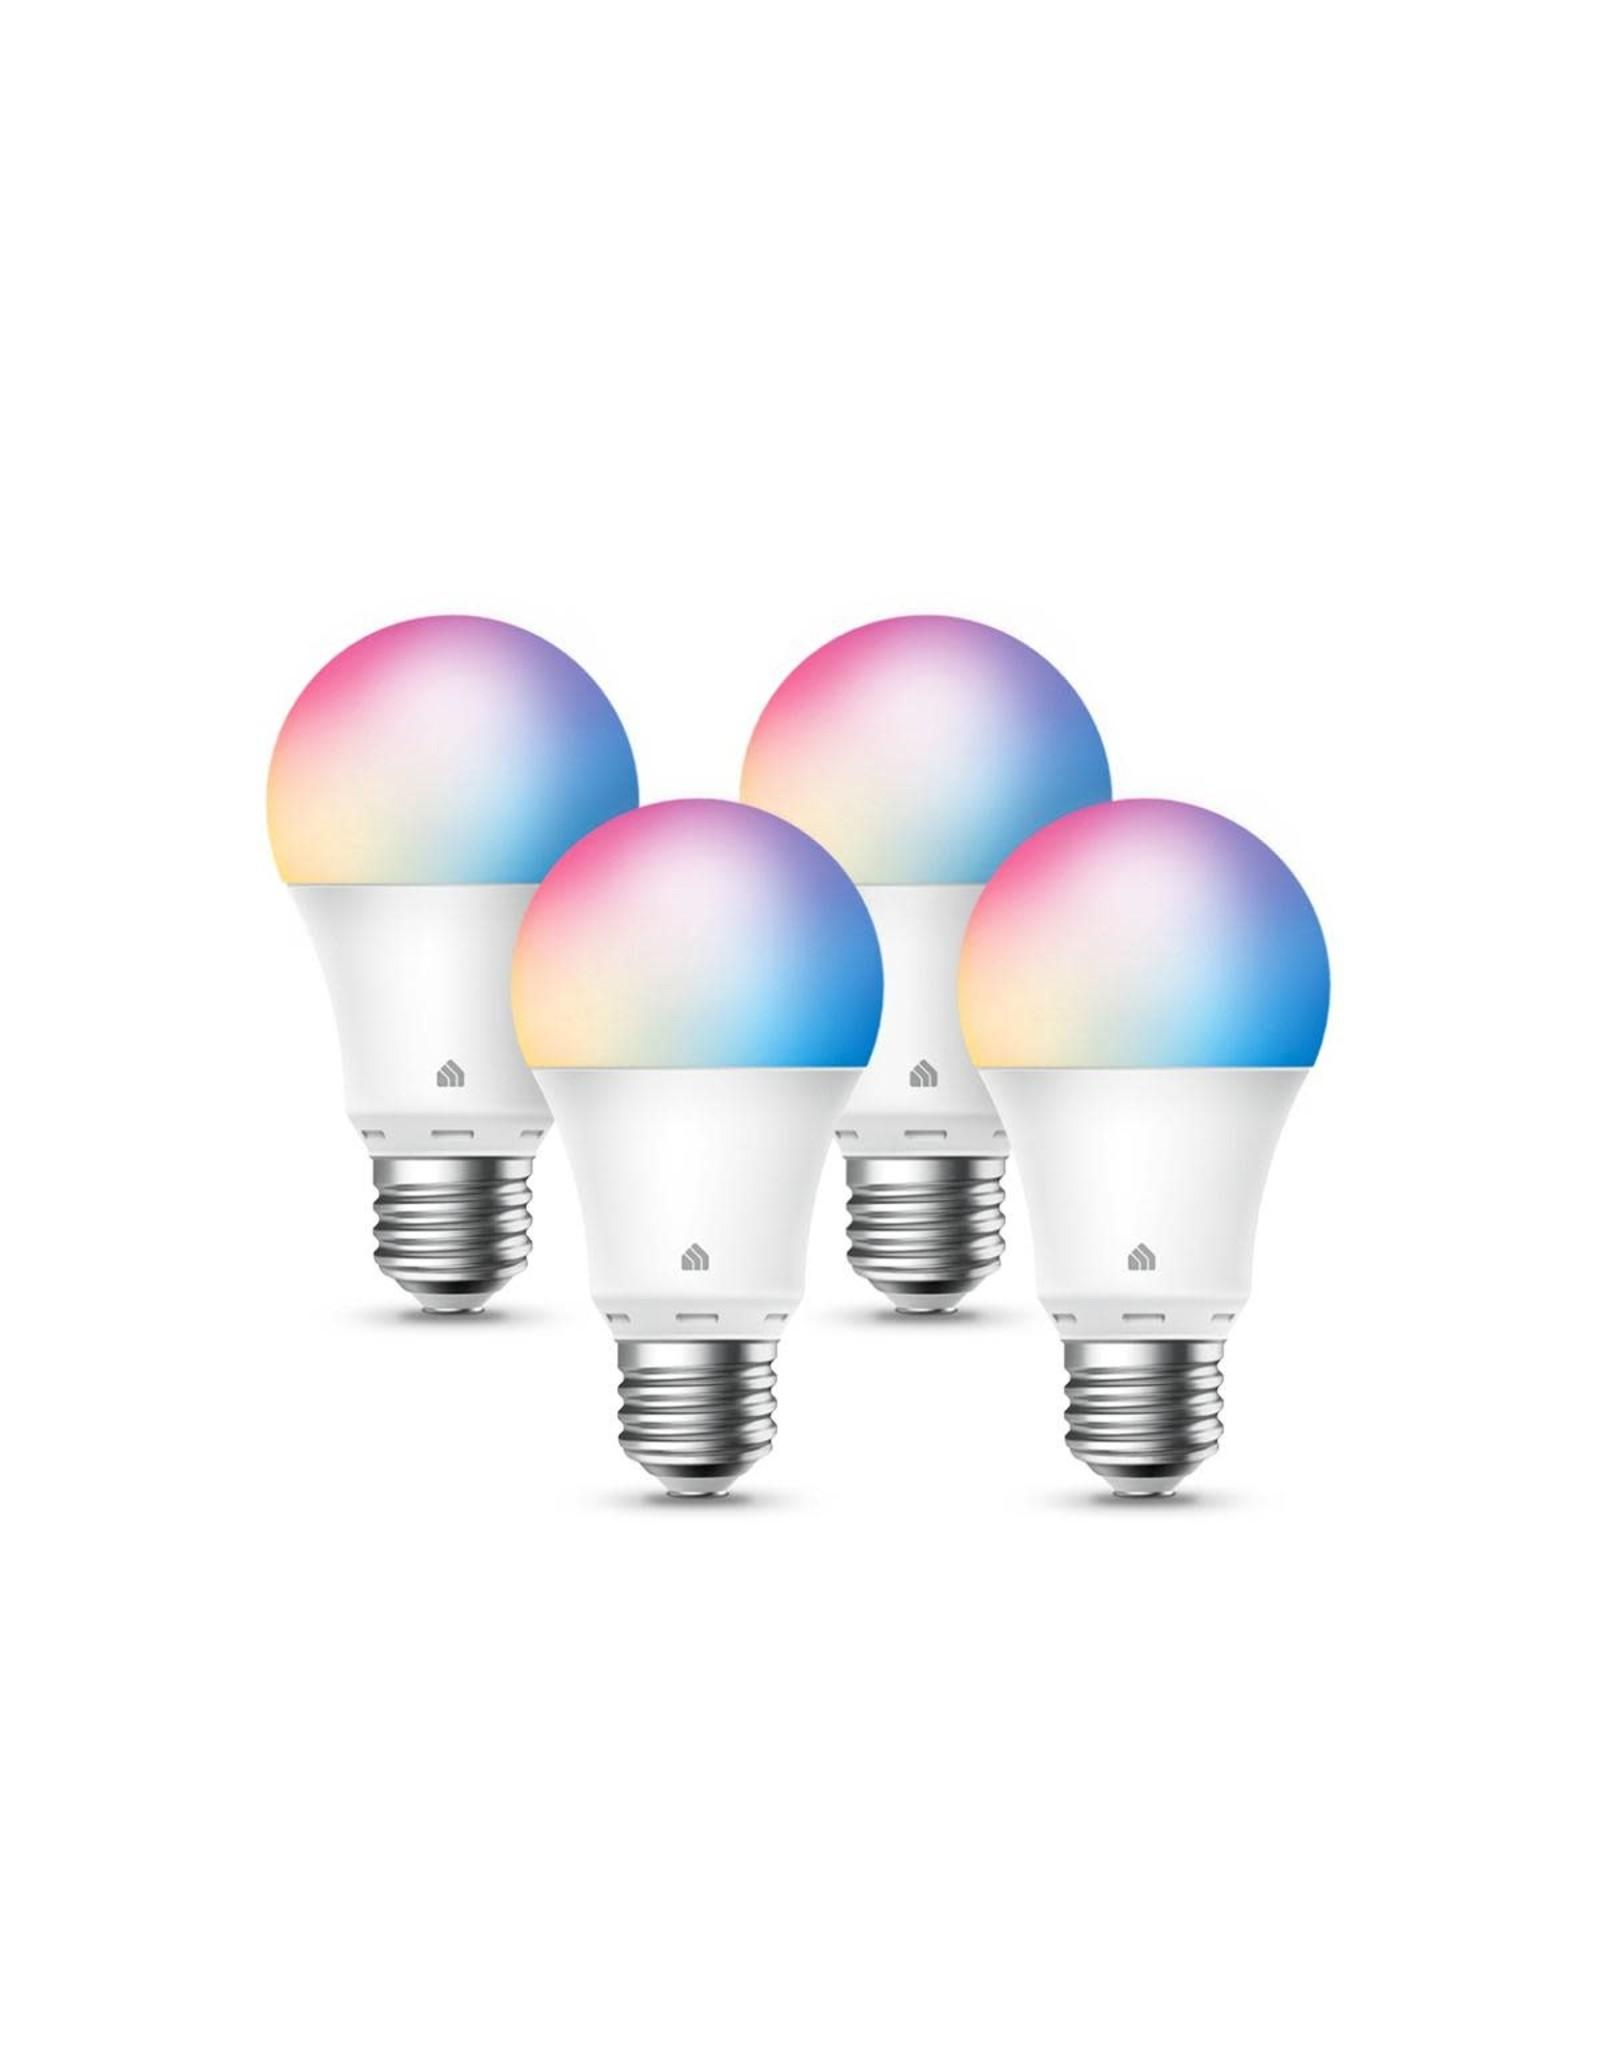 TP Link TP-Link Kasa Smart Light Bulbs, Multicolour, Dimmable 4 Pack